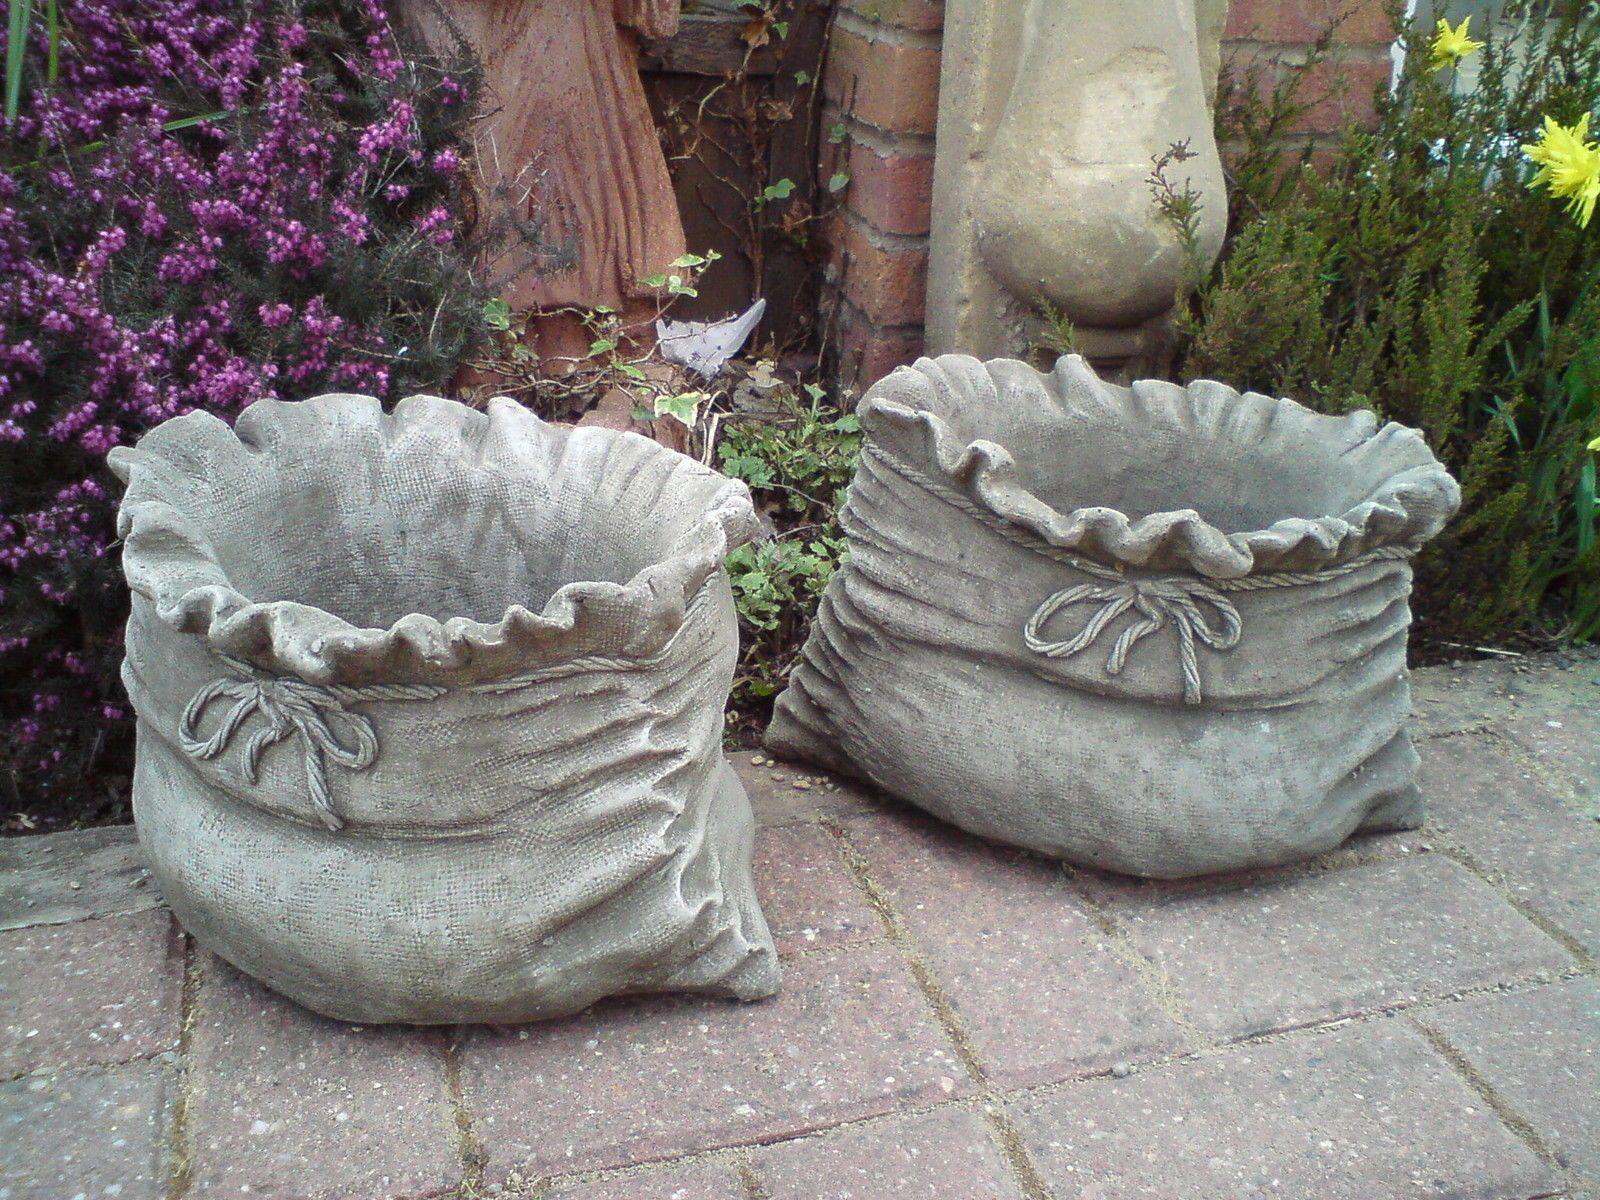 Sack Pot Hand Cast Stone Garden Ornament Flower Planter Basket Patio Onefold Uk Ebay In 2020 Concrete Diy Projects Concrete Diy Diy Concrete Planters